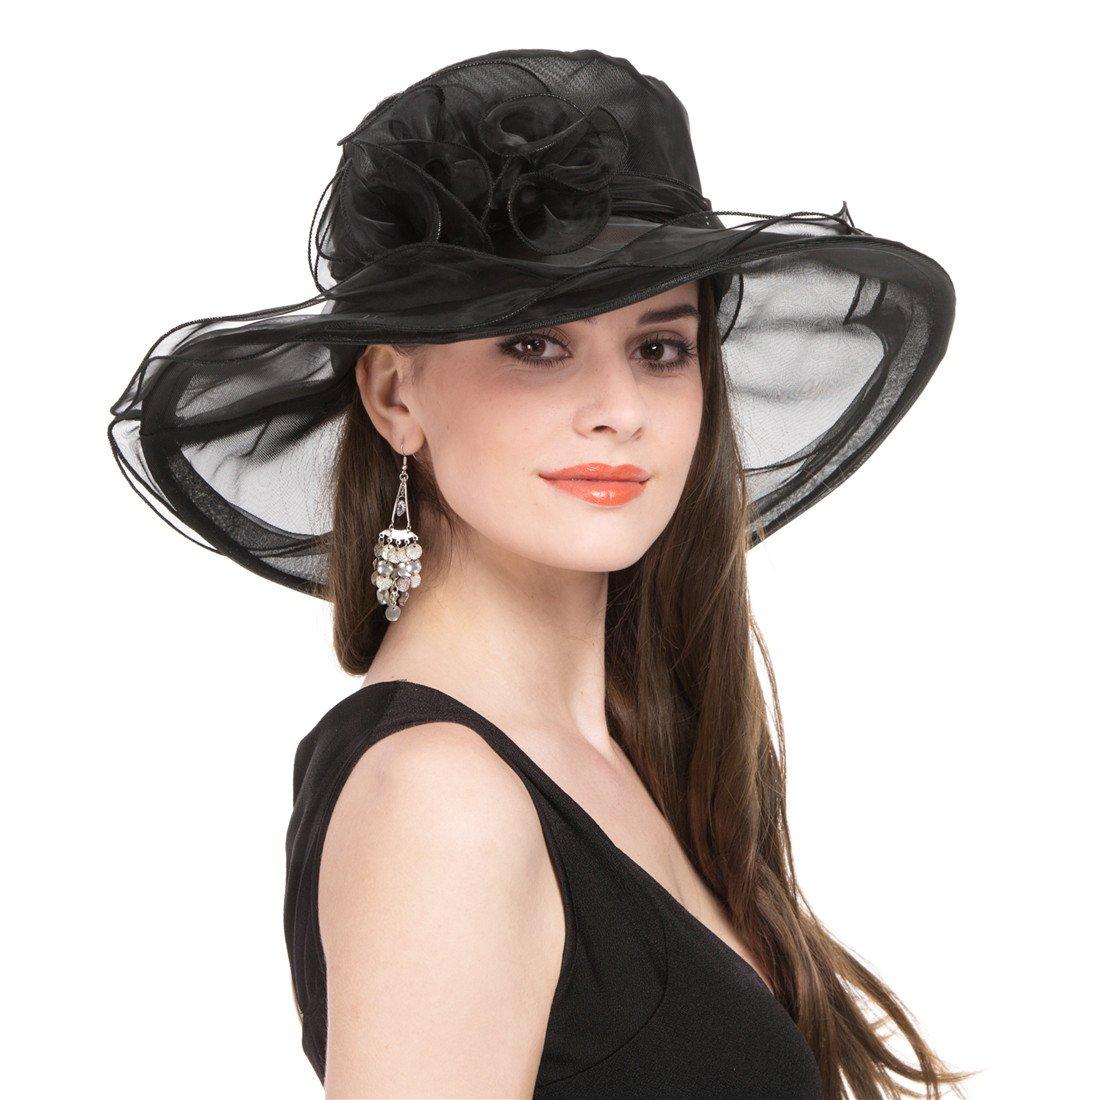 25d1b4e52eb995 SAFERIN Women's Organza Church Kentucky Derby Fascinator Bridal Tea Party  Wedding Hat (1-Black) at Amazon Women's Clothing store: